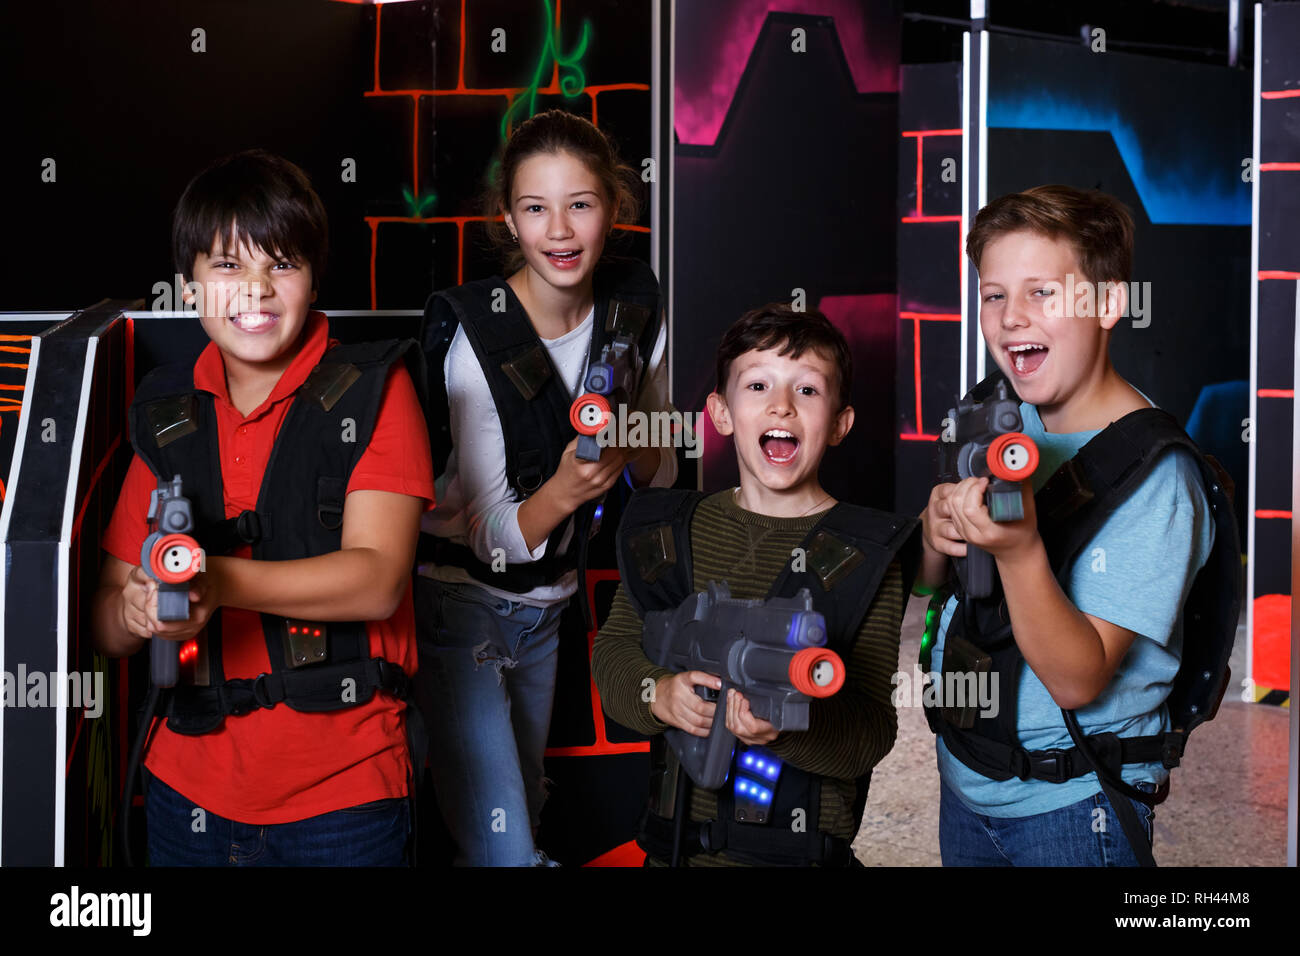 Smiling kids with laser pistols posing together in dark